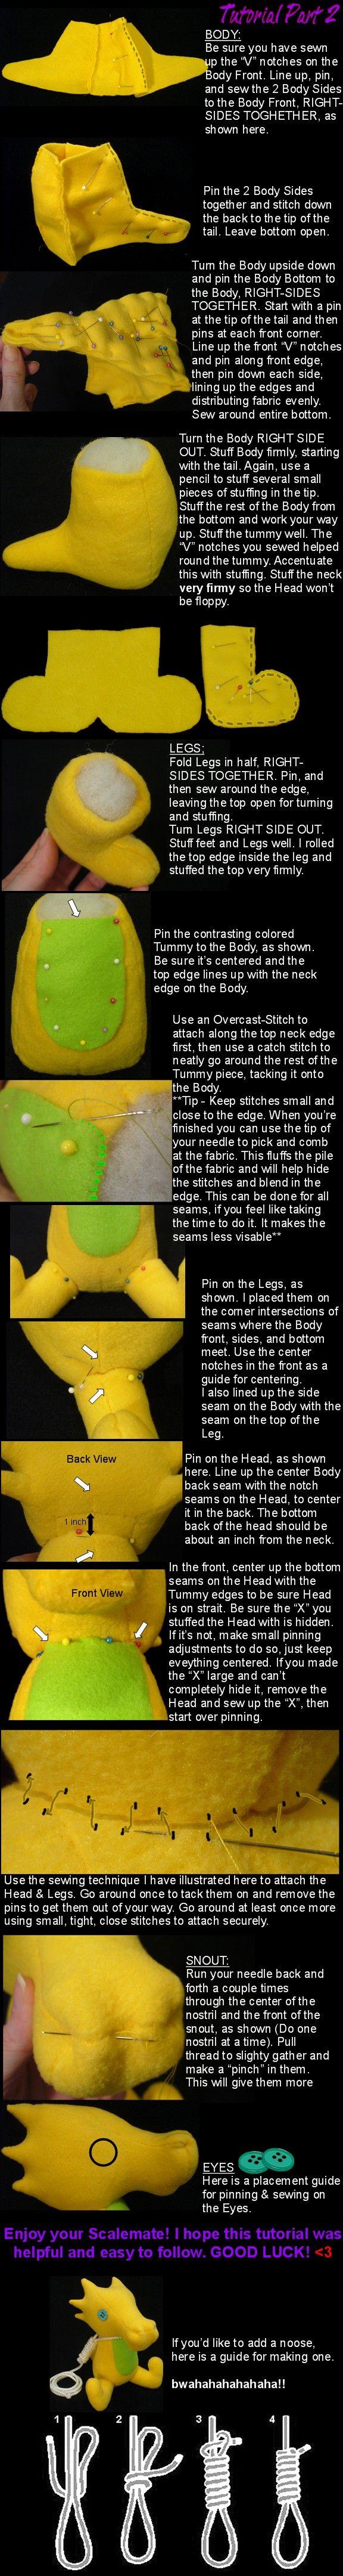 Scalemate sewing tutorial Part 2 by lishlitz.deviantart.com on @deviantART